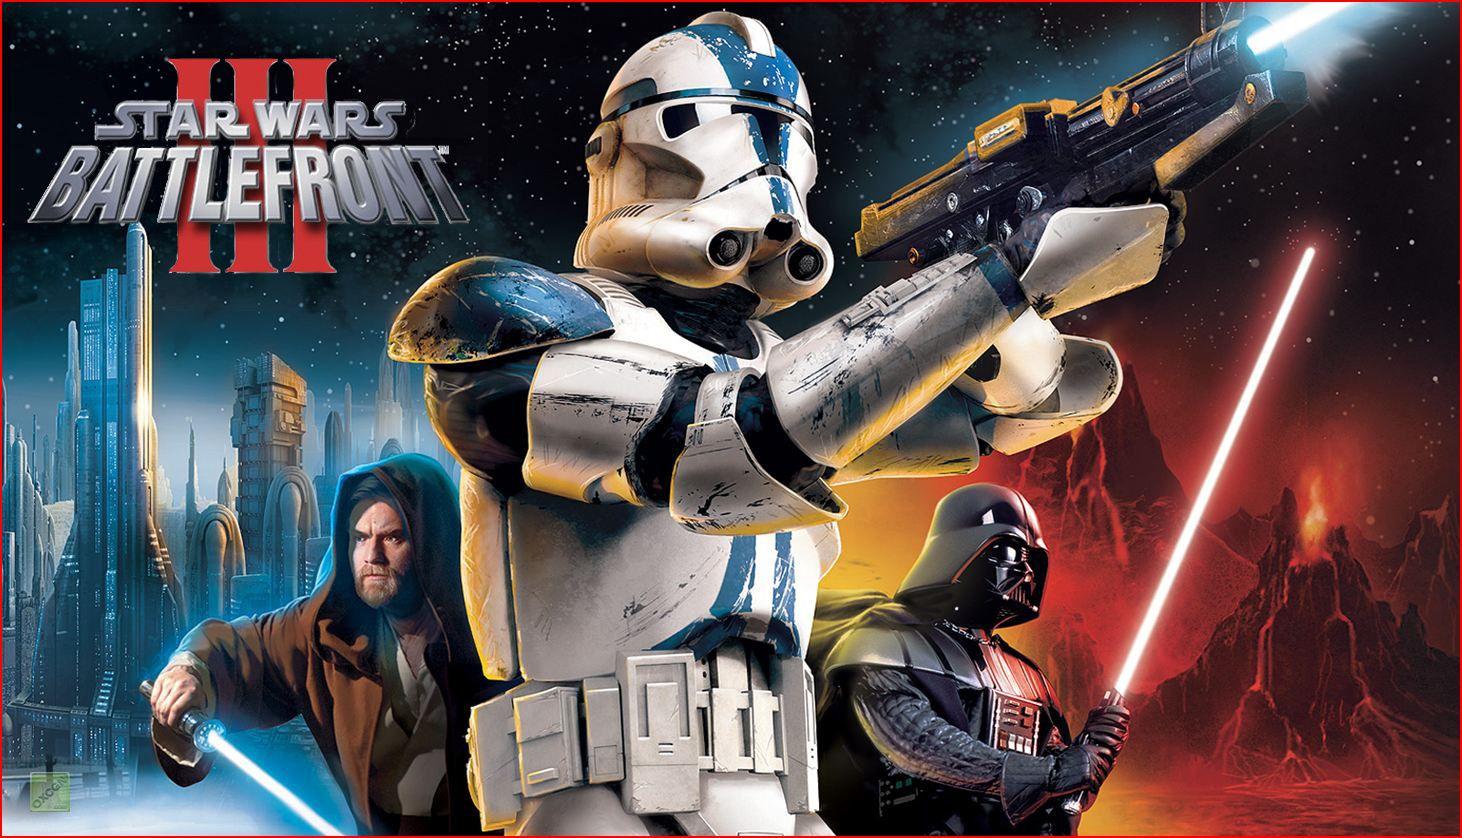 [E3 2013] EA annonce Star Wars Battlefront